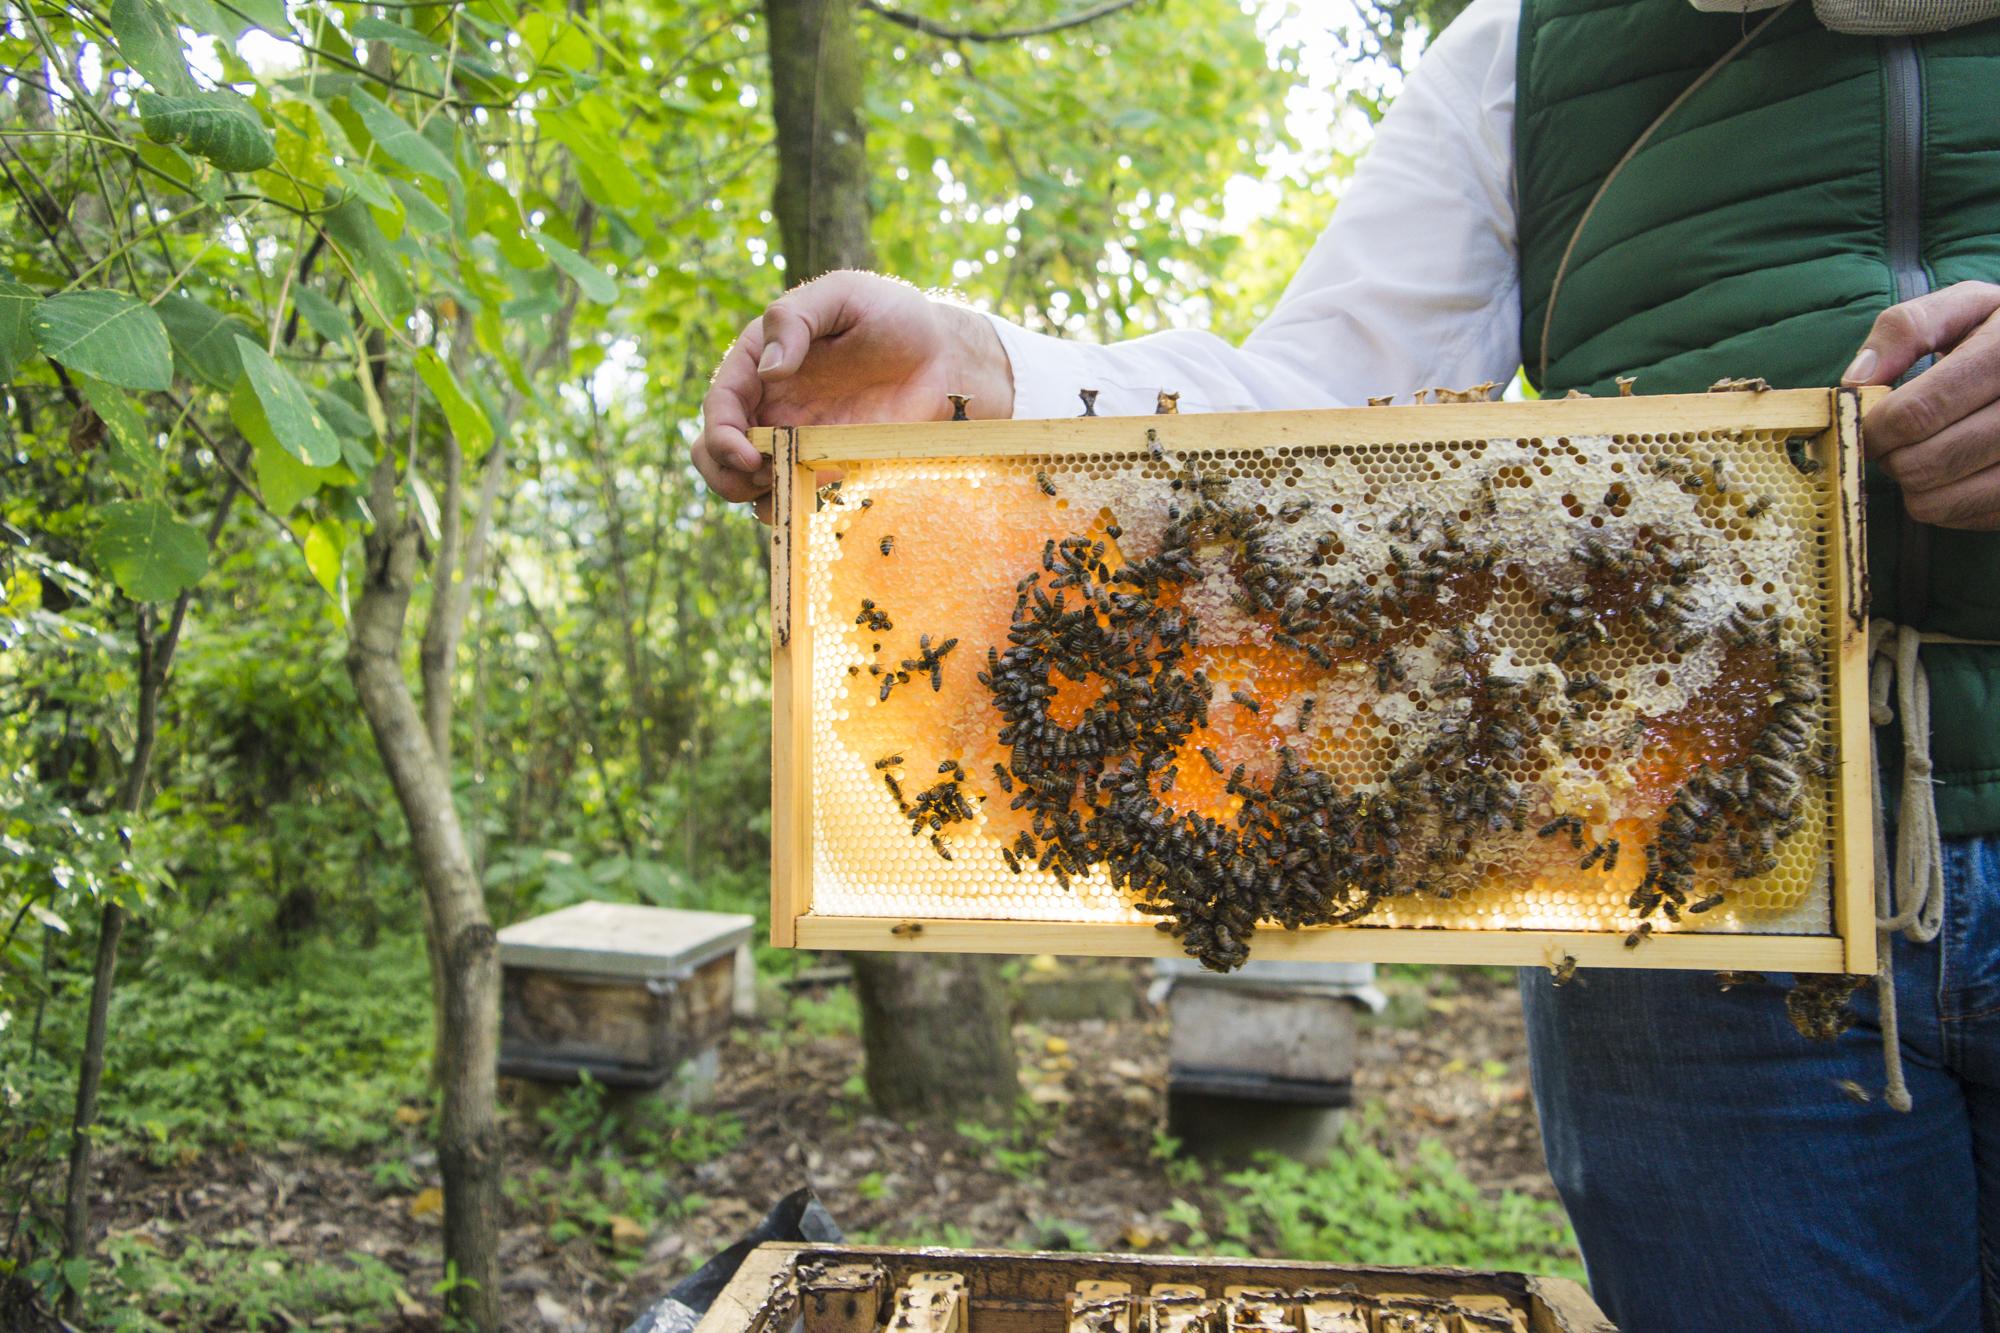 металл пчеловод улей пчелы картинки работе